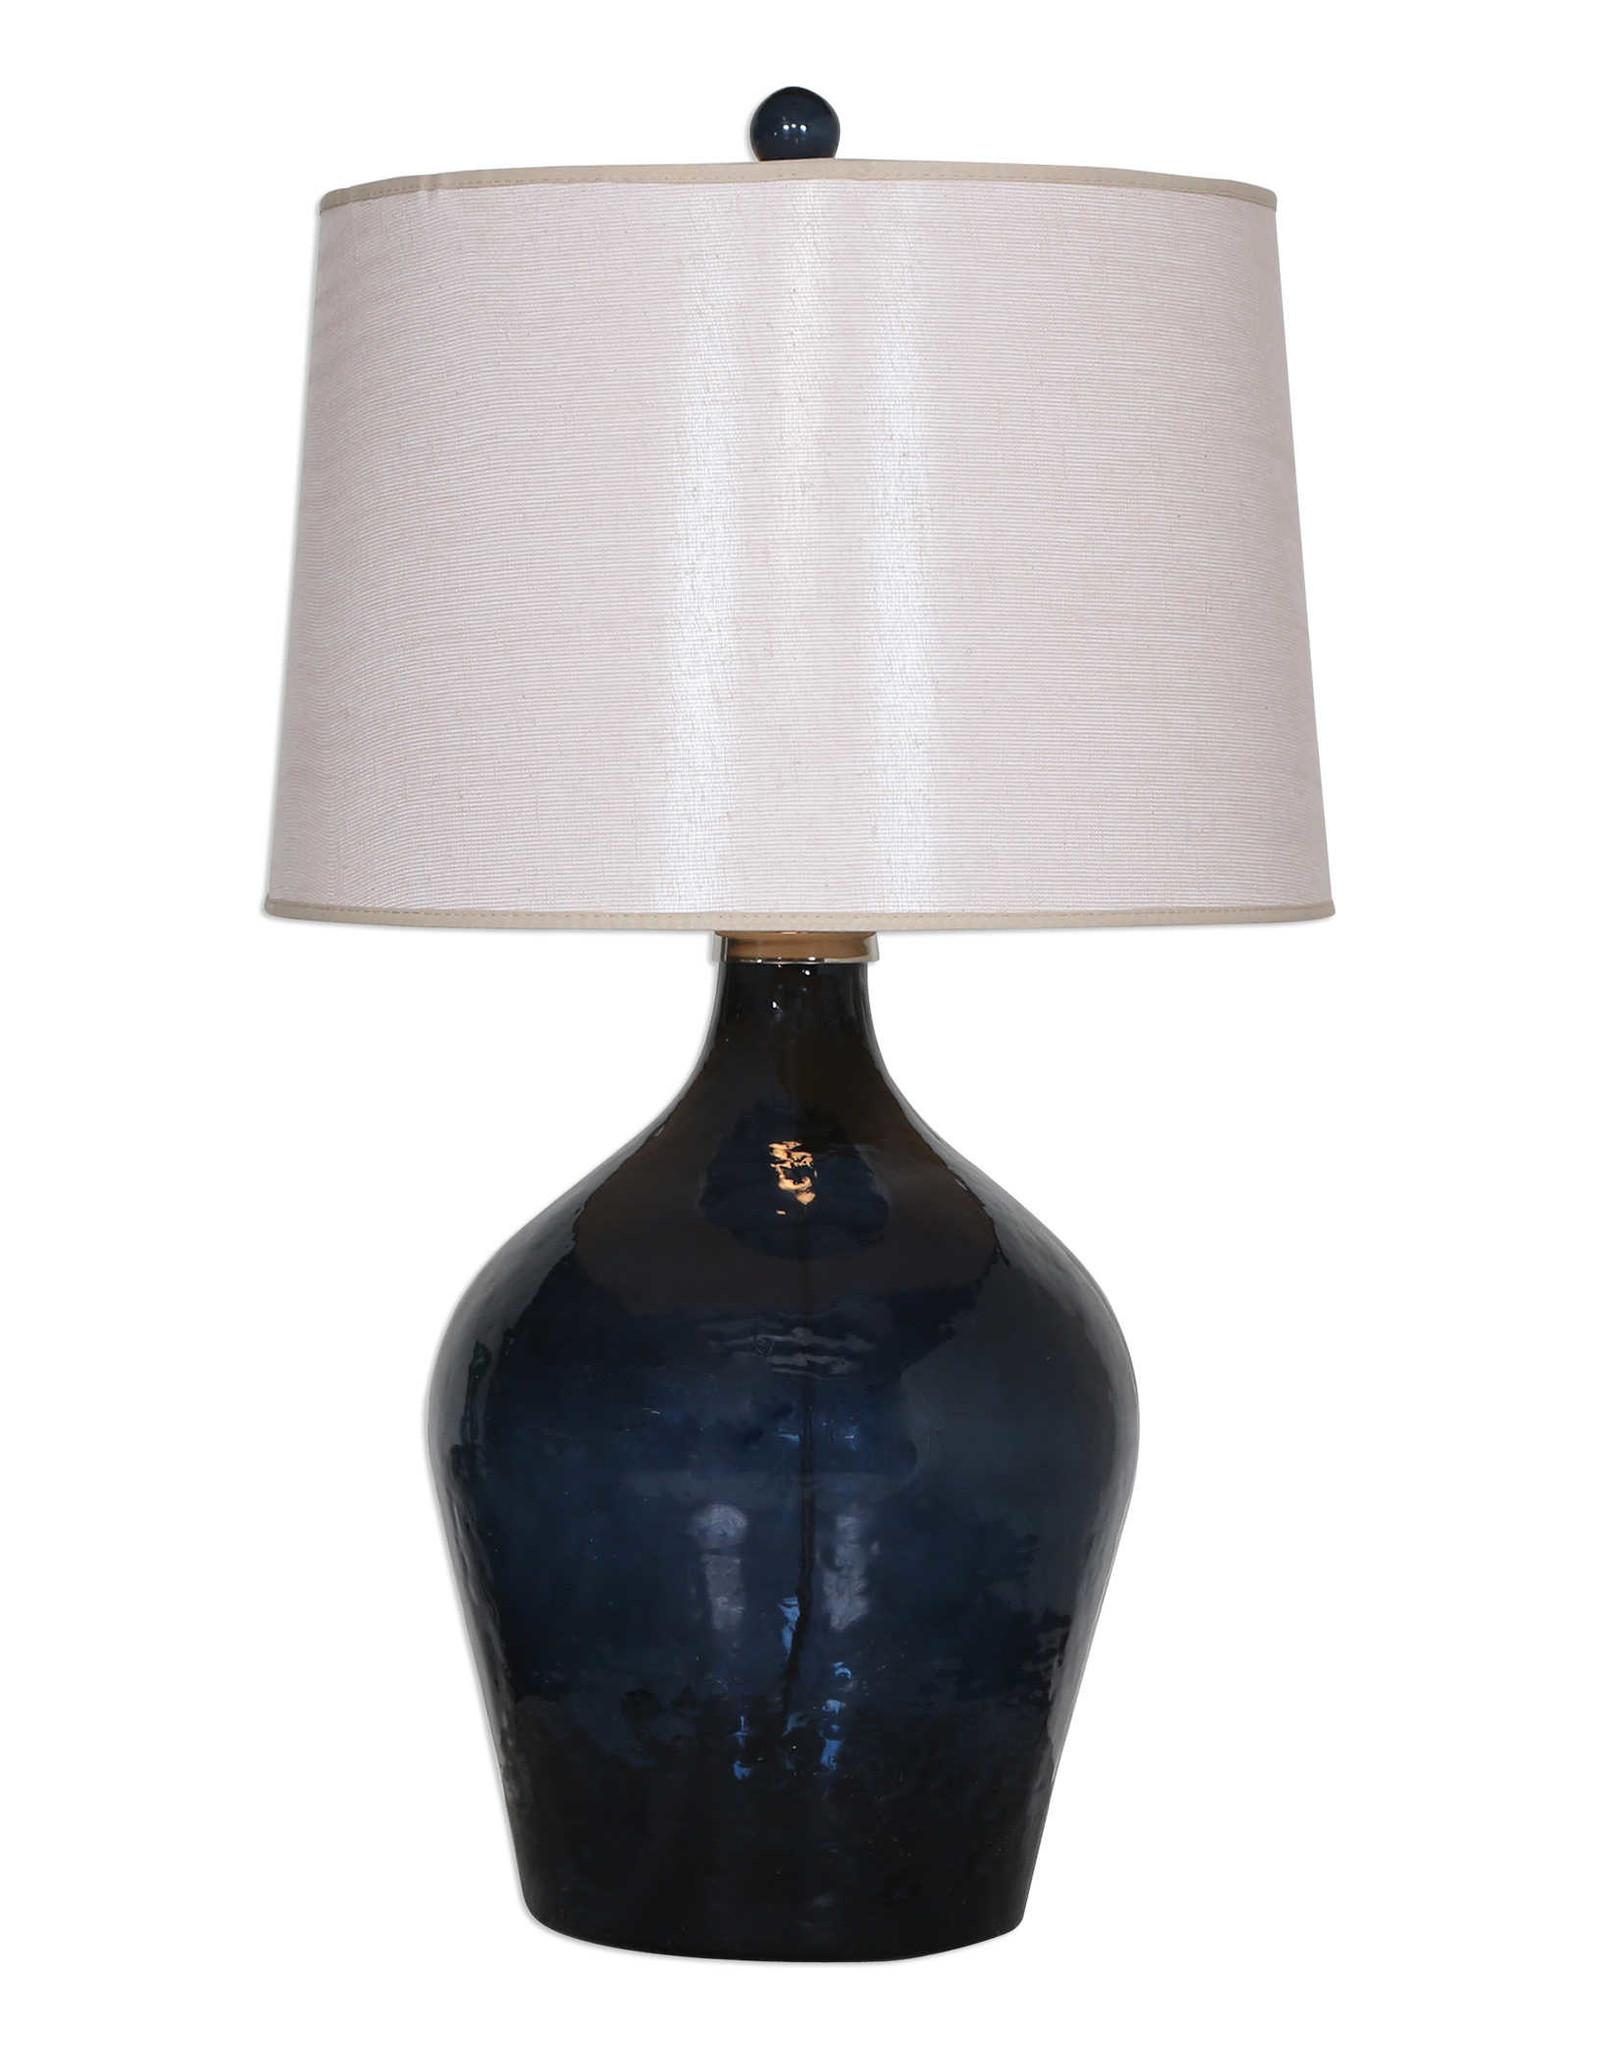 Website Lamone Table Lamp